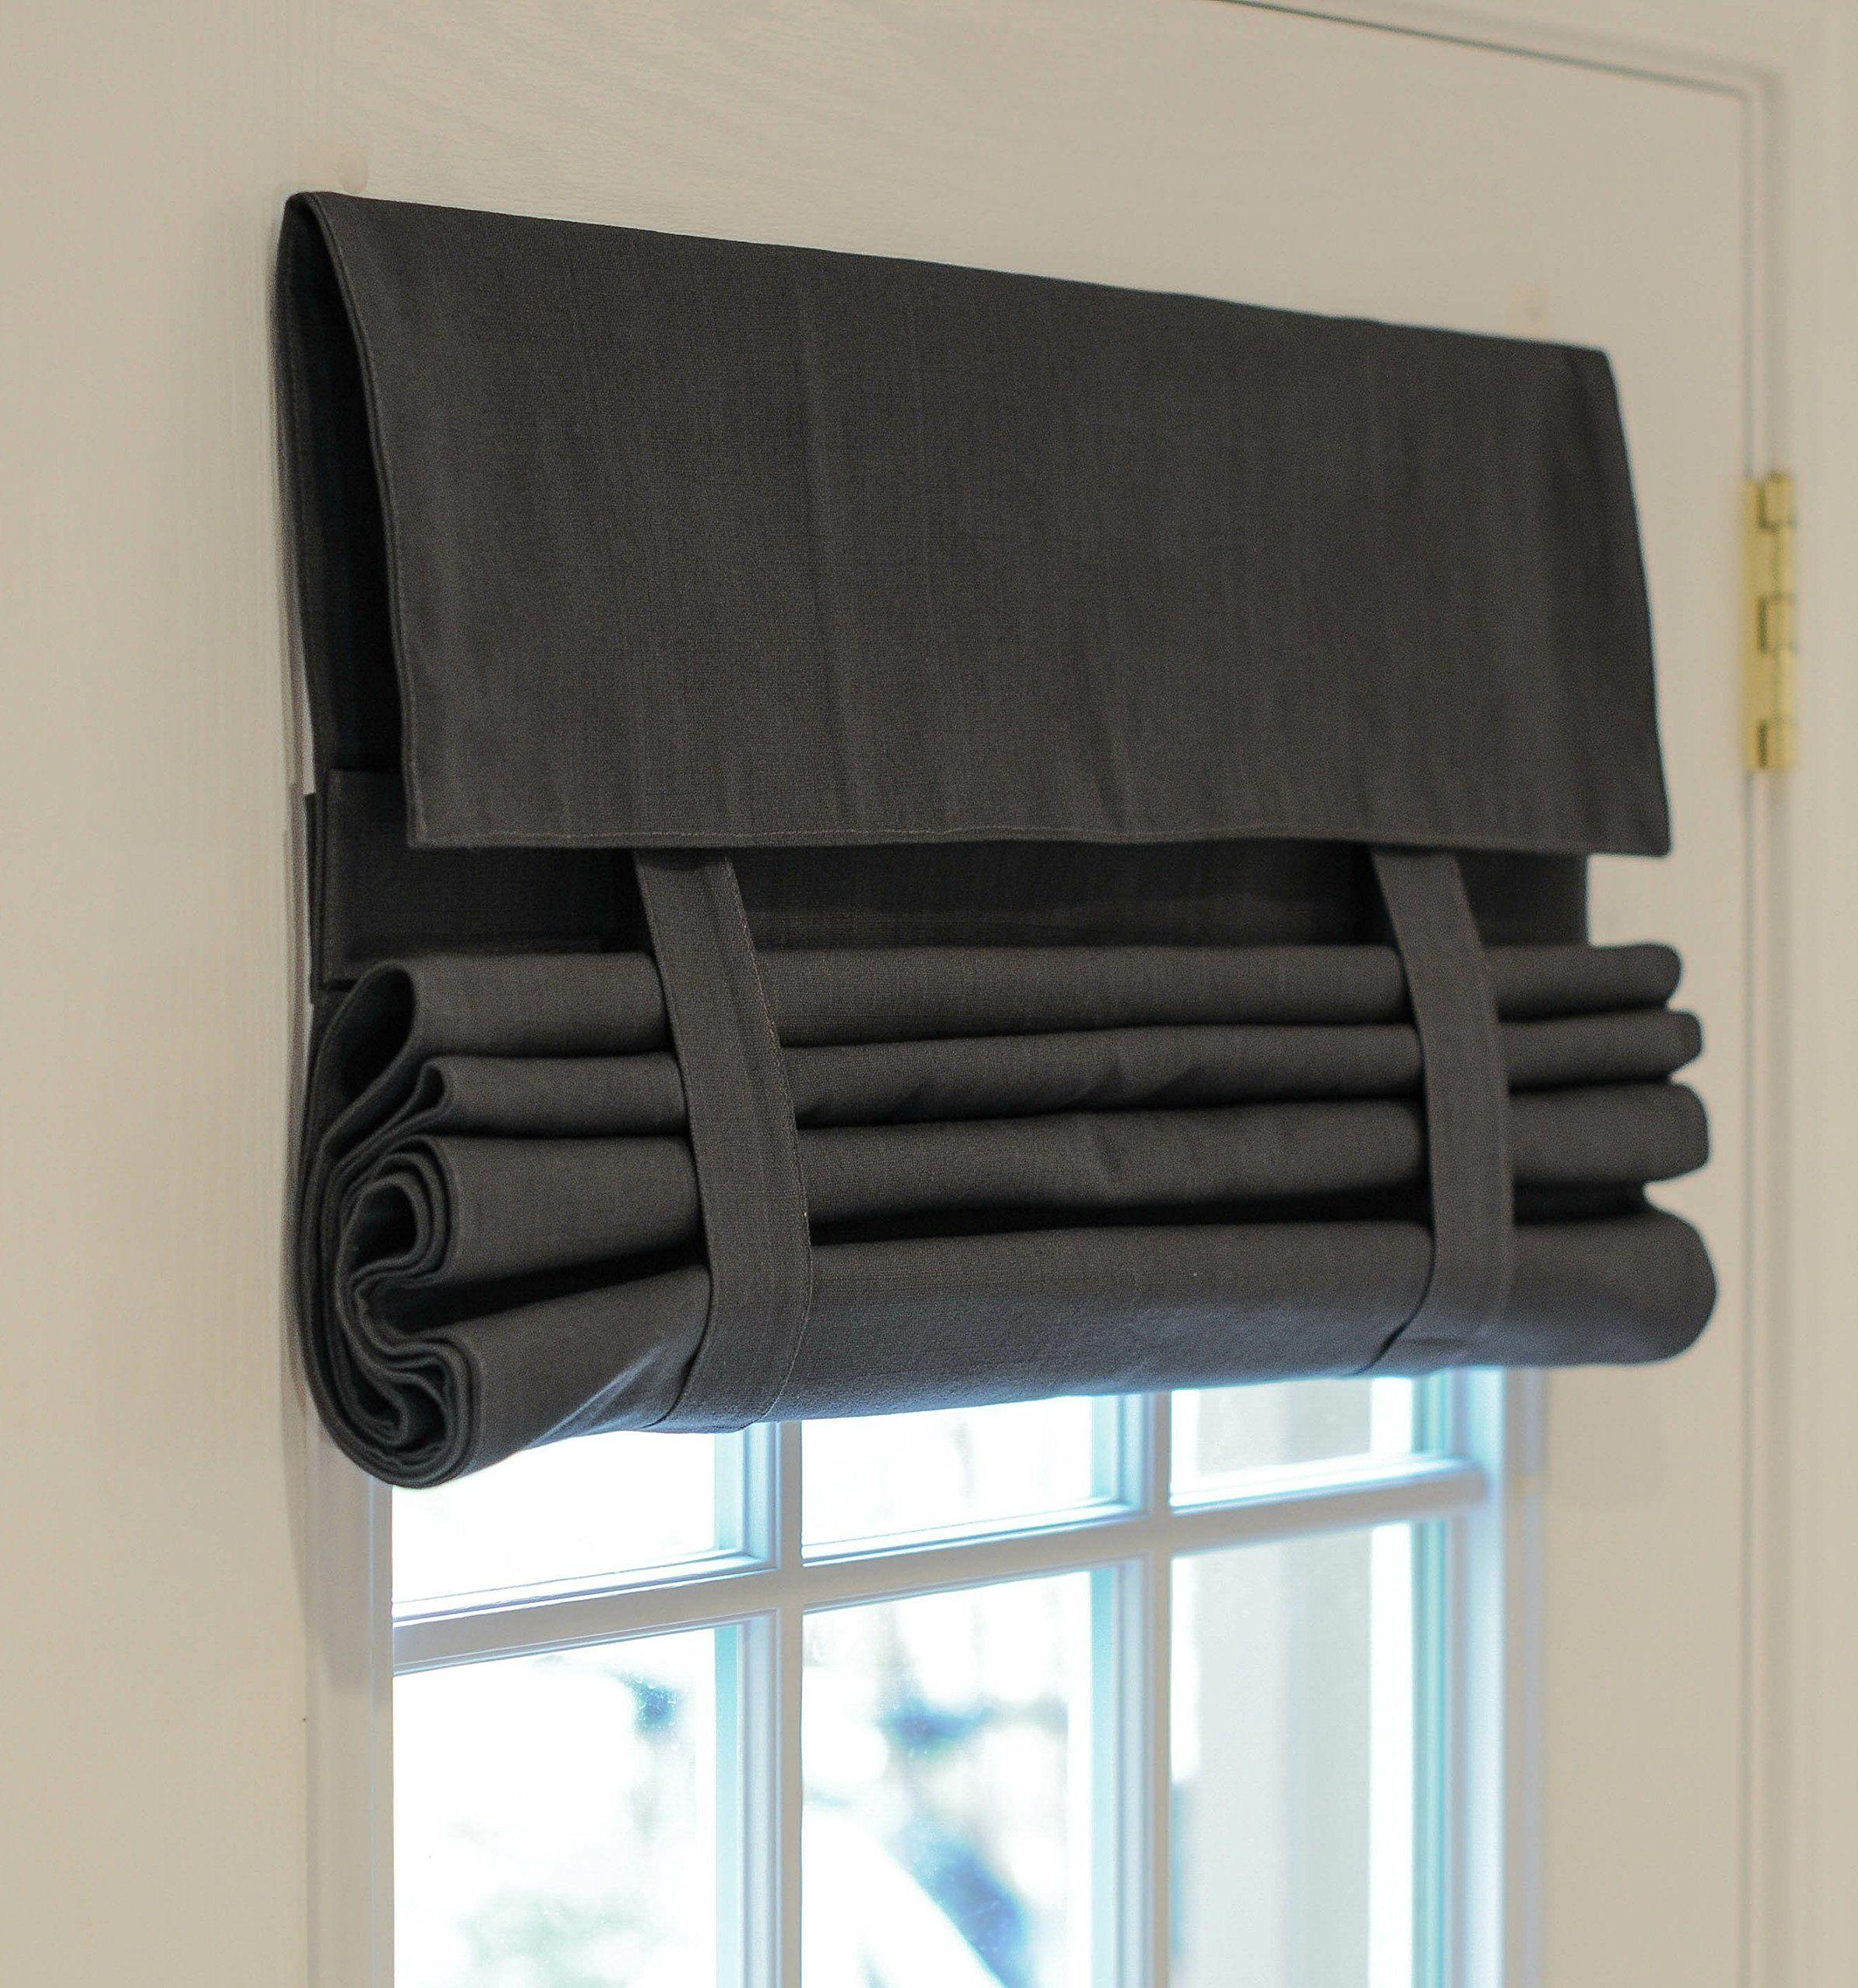 Velcro french door curtain panels - Gray French Door Curtain 1 Panel